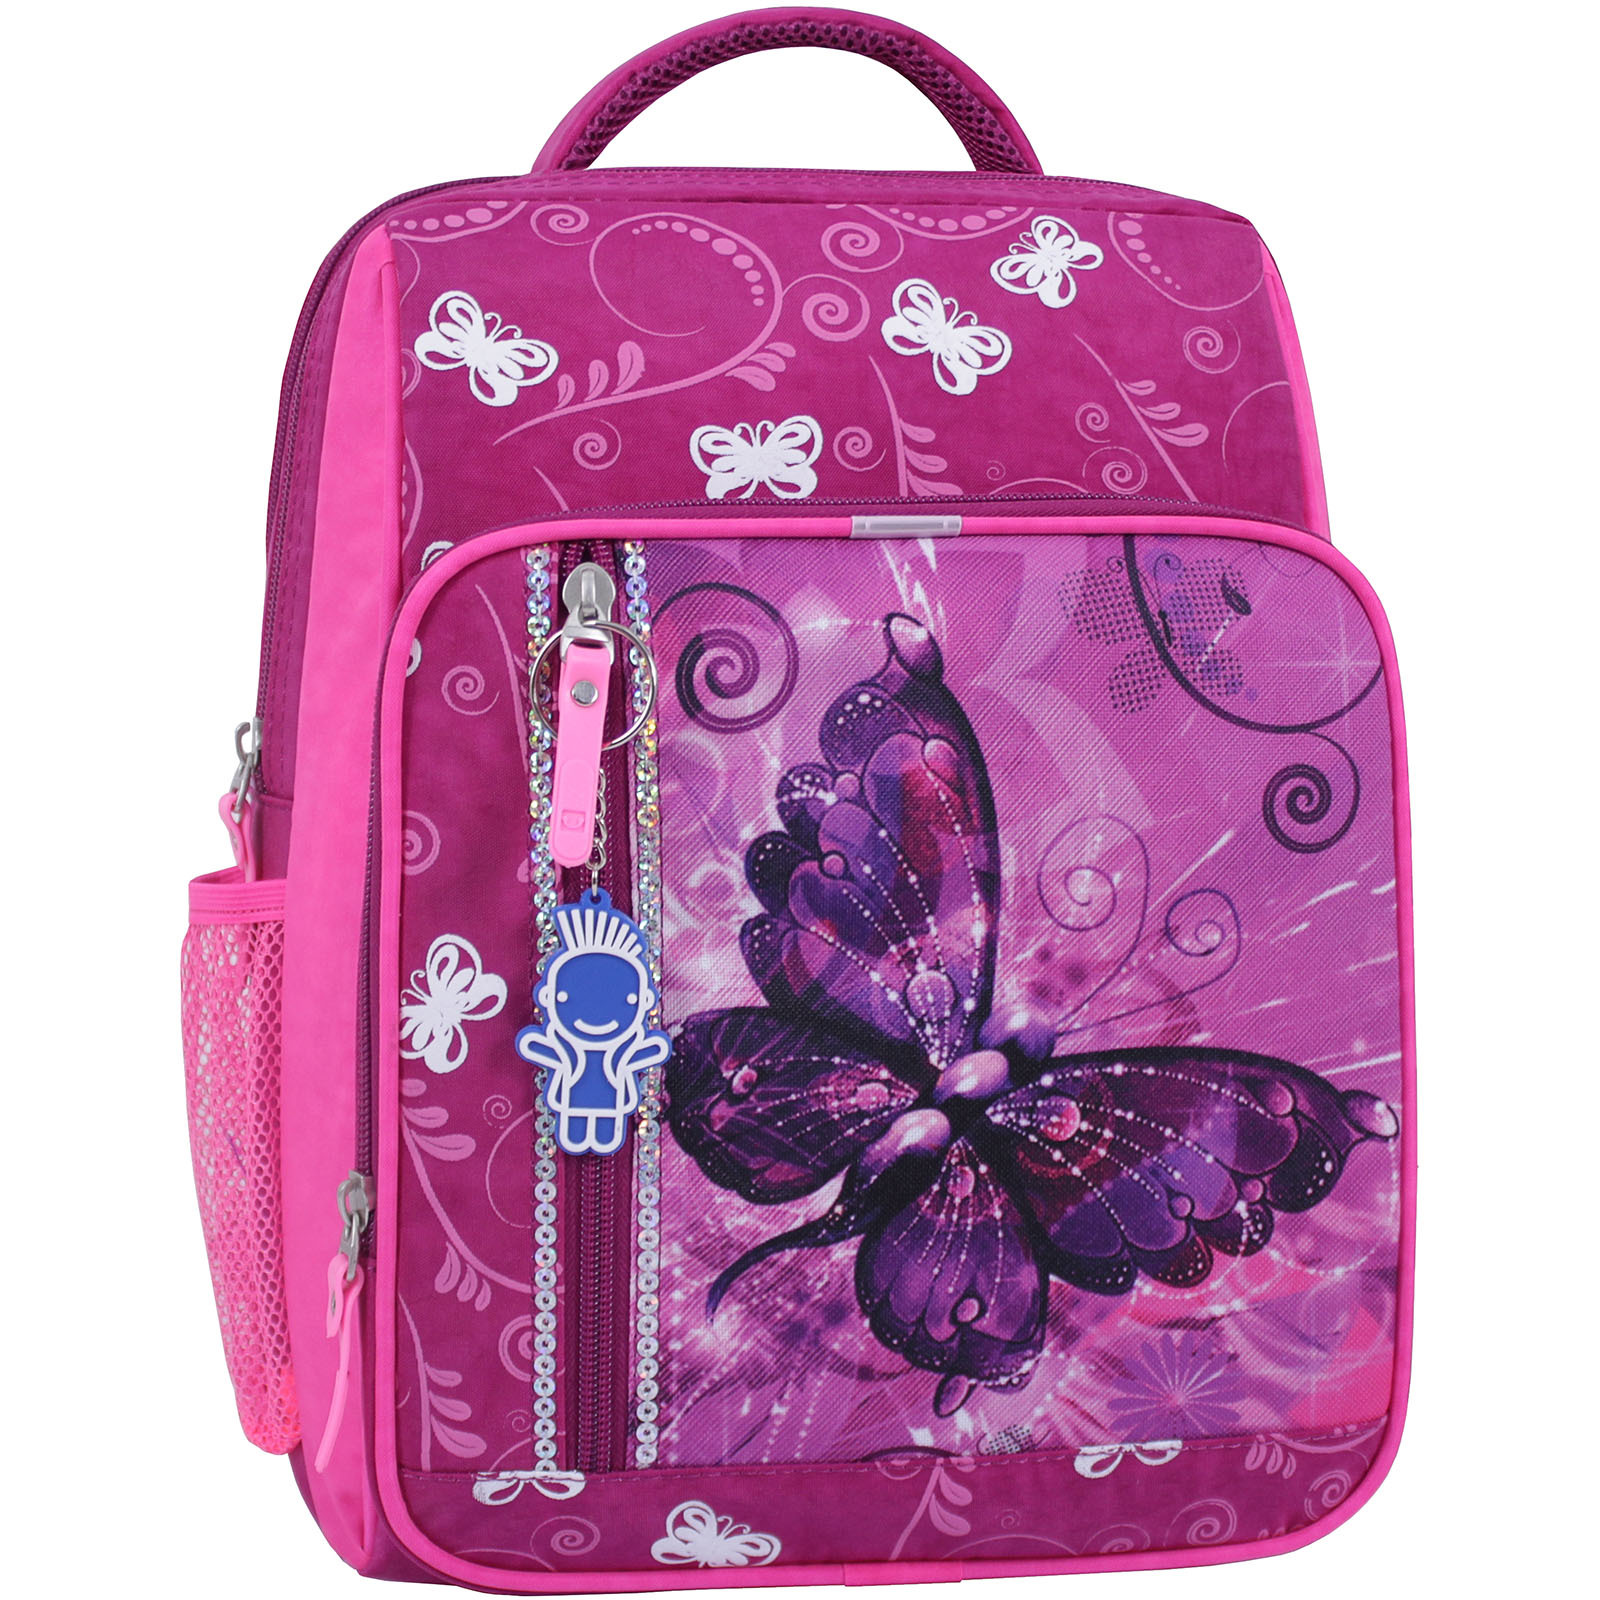 Школьные рюкзаки Рюкзак школьный Bagland Школьник 8 л. 143 малиновый 615 (0012870) IMG_0835_суб.615.JPG